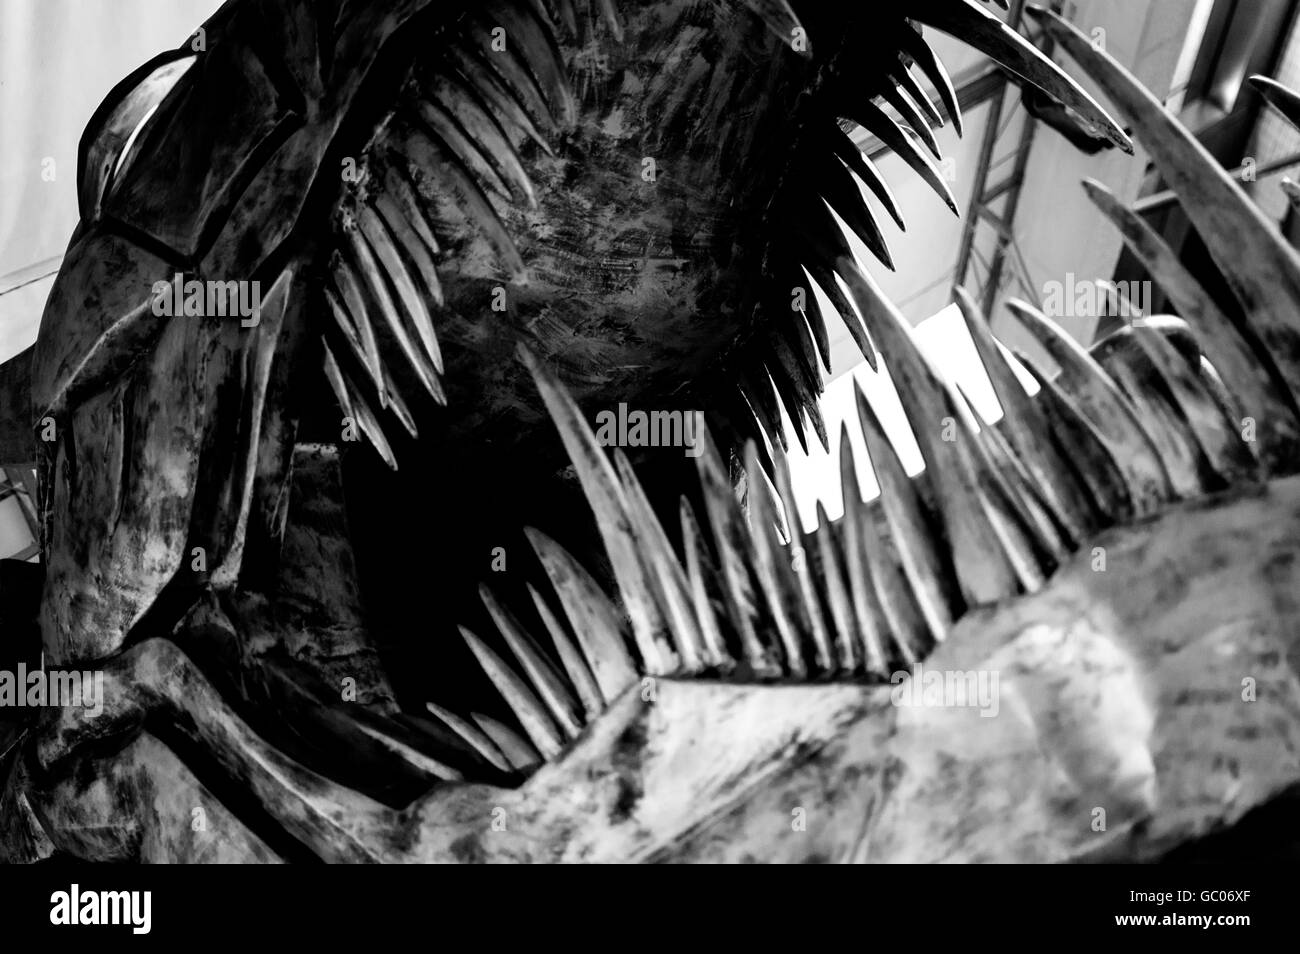 Close-Up Of Dinosaur Sculpture At Museum - Stock Image